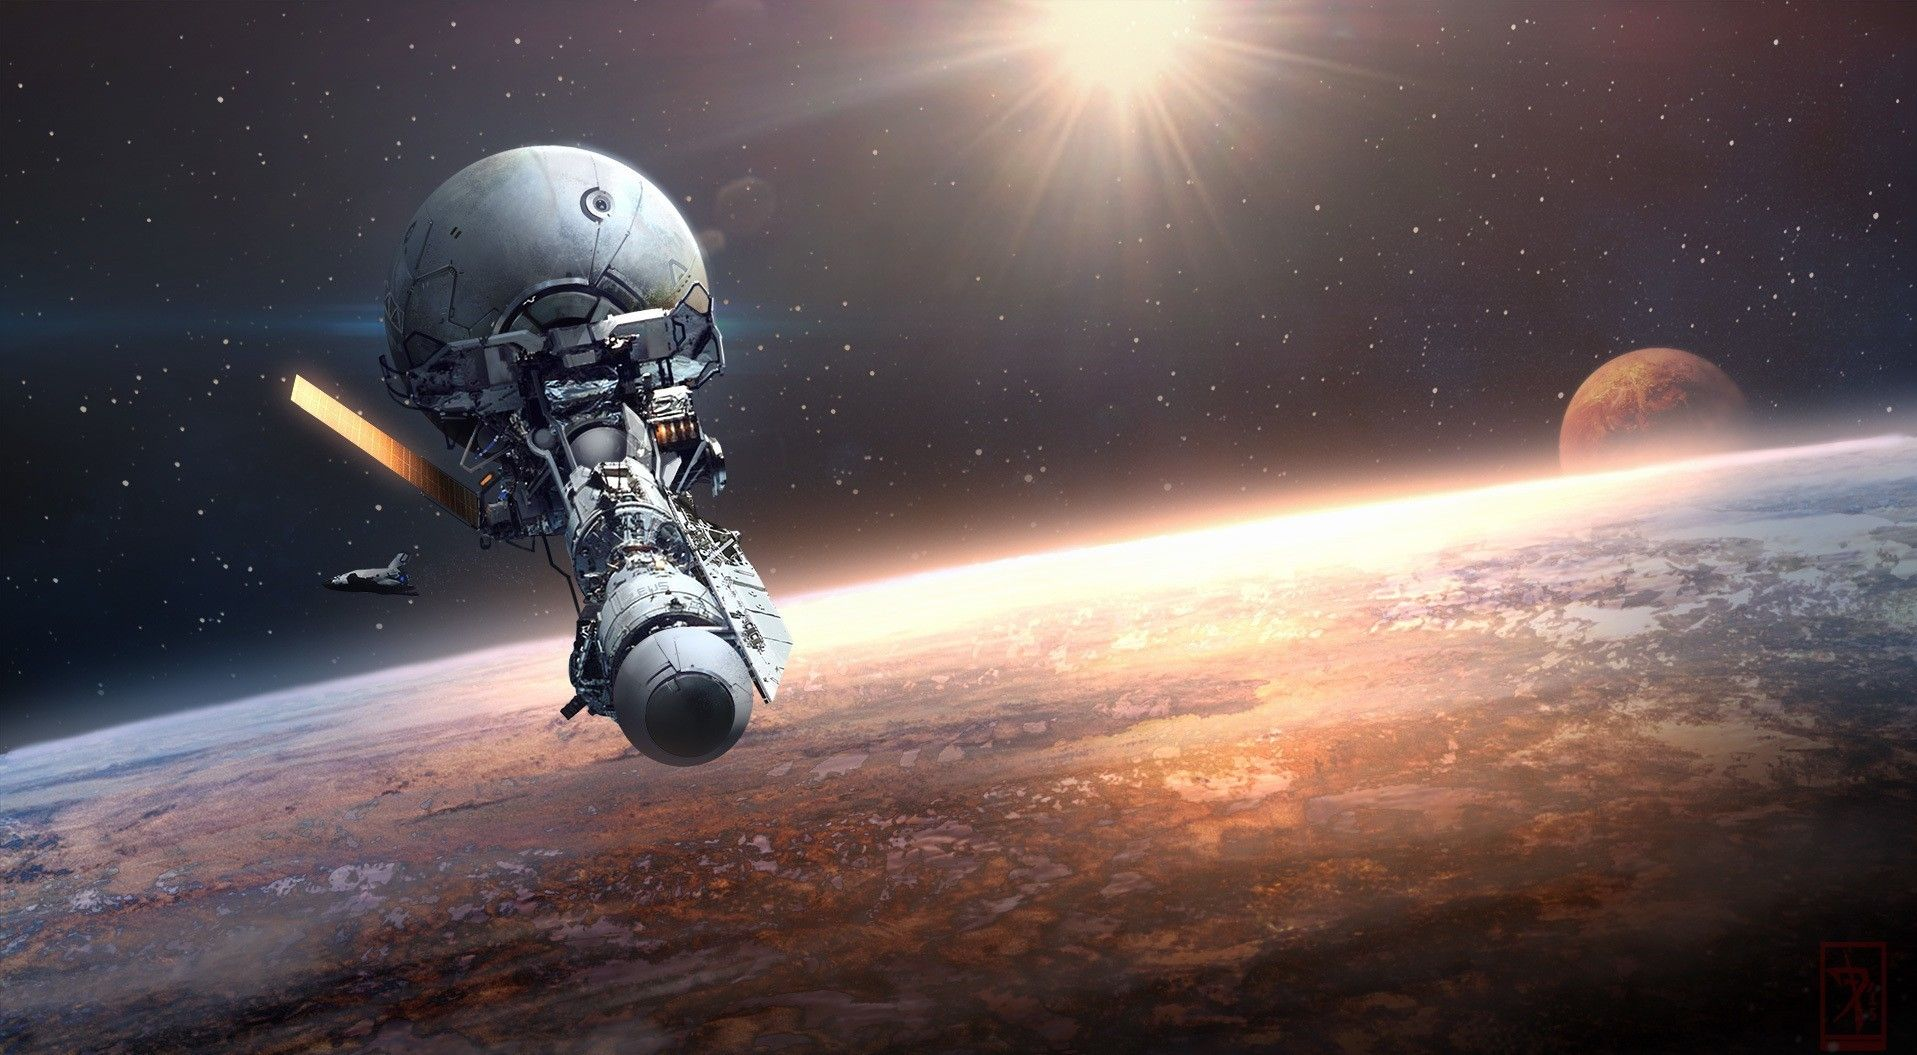 Wallpaper Planet Vehicle Artwork Earth Science